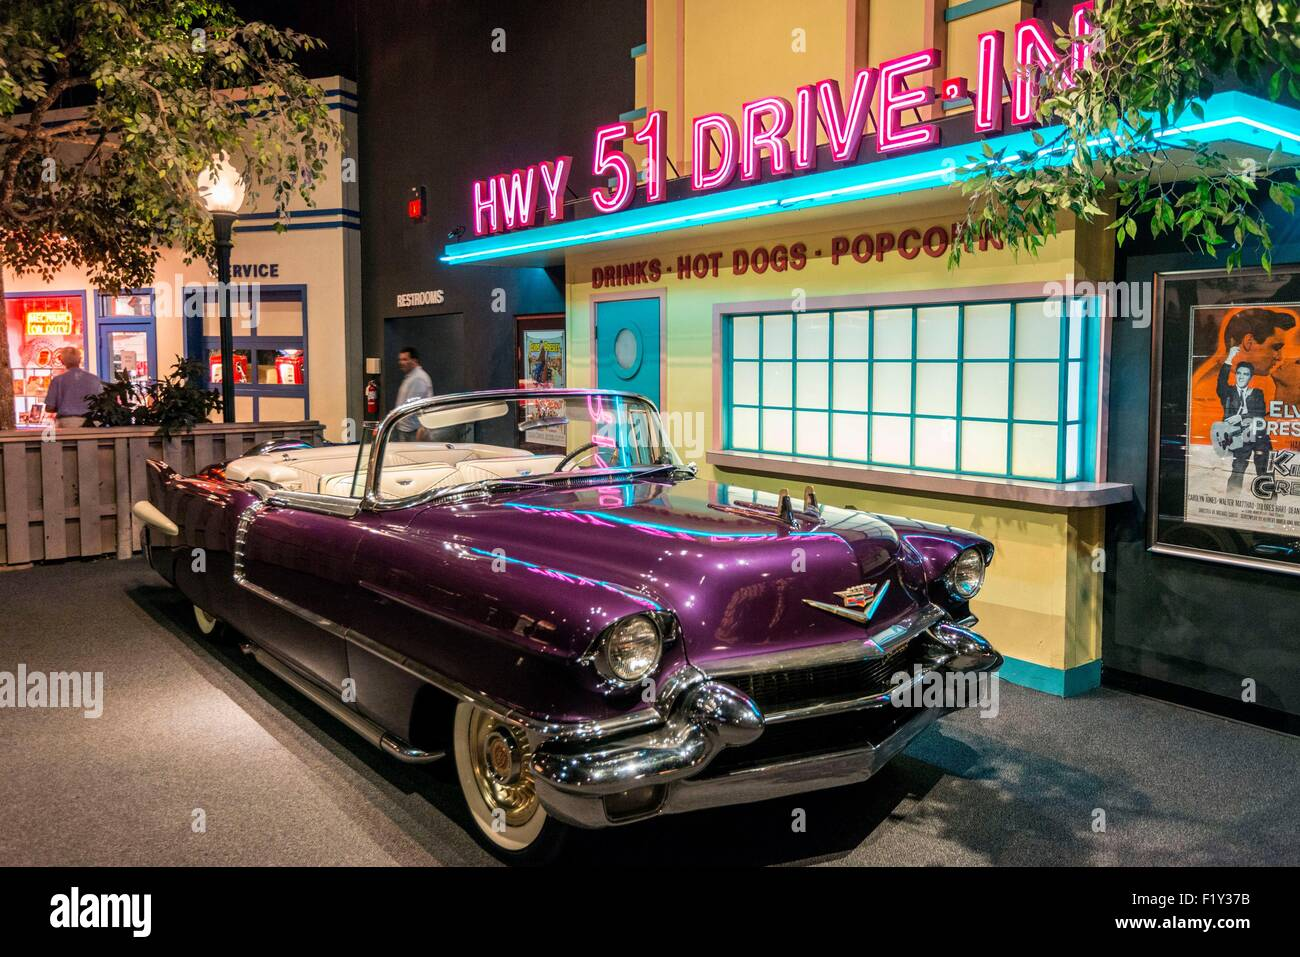 United States, Tennessee, Memphis, Graceland, Elvis Presley's house, memorabillia rooms - Stock Image